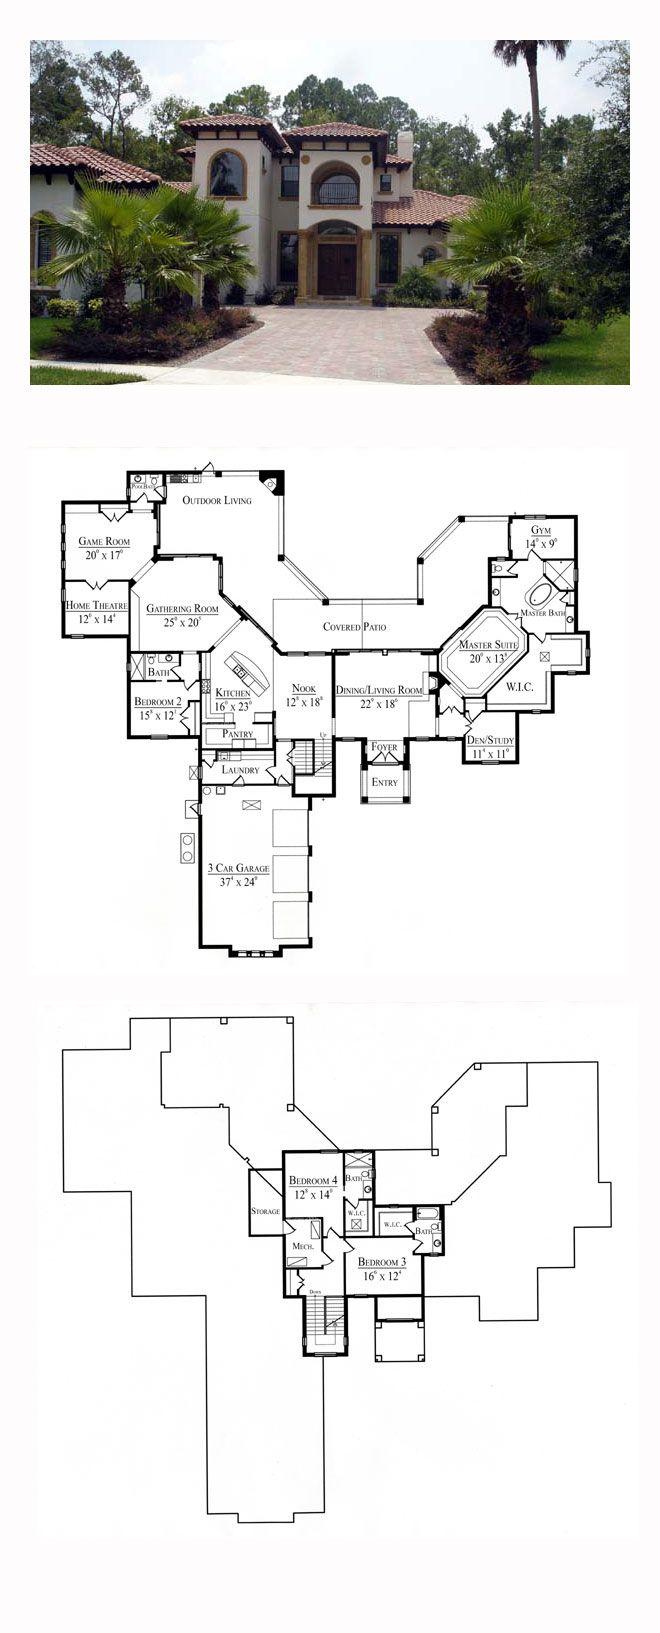 Fantastic 311 Best Images About Architecture Plan Design On Pinterest Largest Home Design Picture Inspirations Pitcheantrous